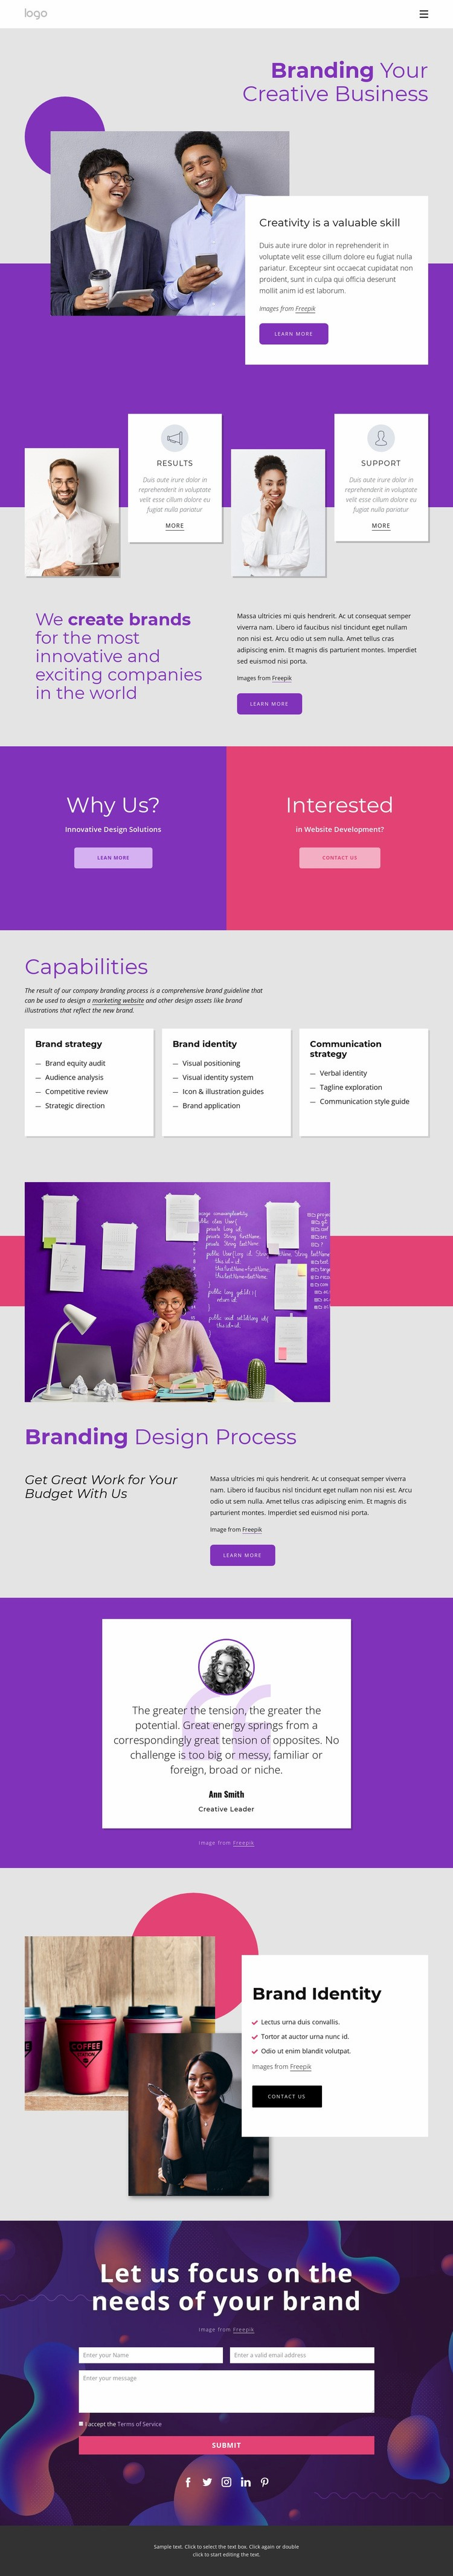 International brand and design agency Web Page Designer